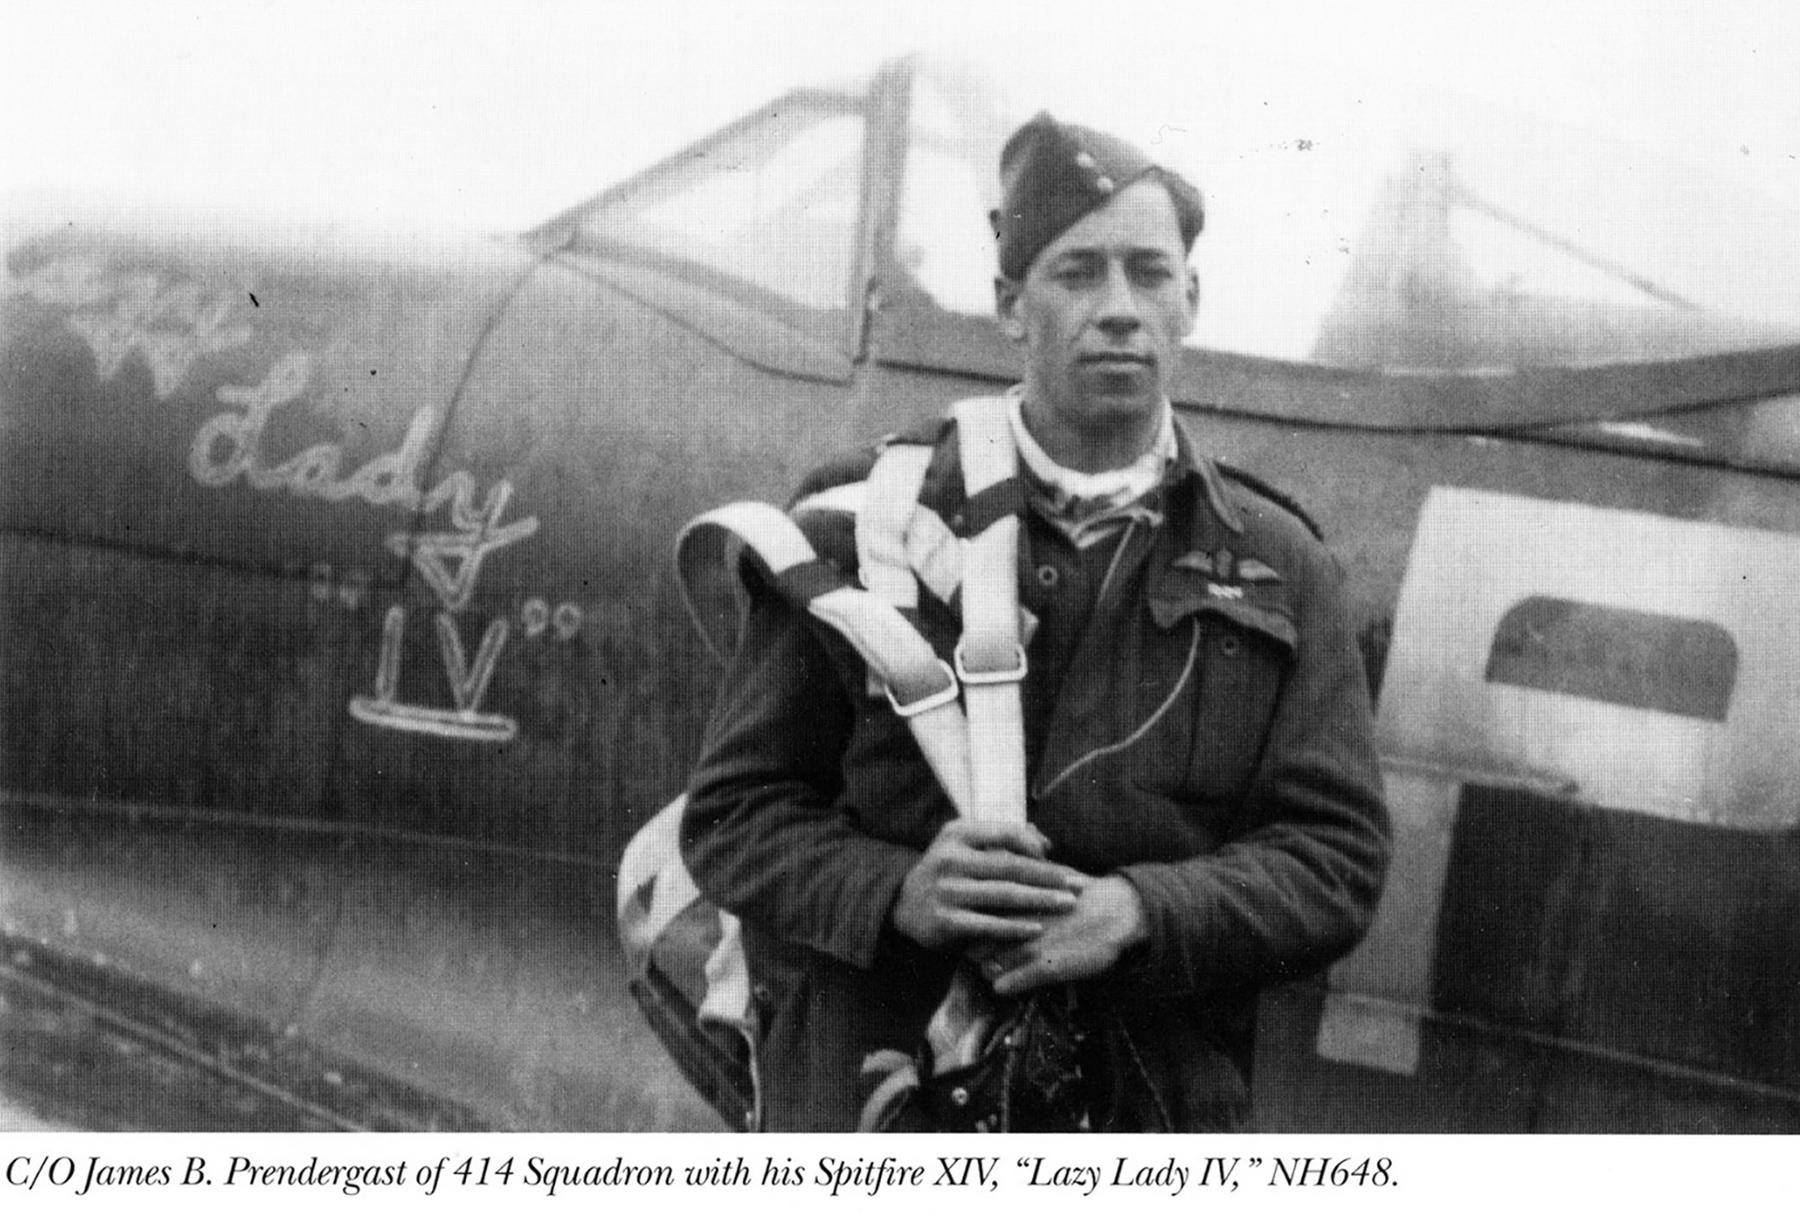 Spitfire FRXIV RCAF 414Sqn James B Prendergast NH648 Apr 1945 01